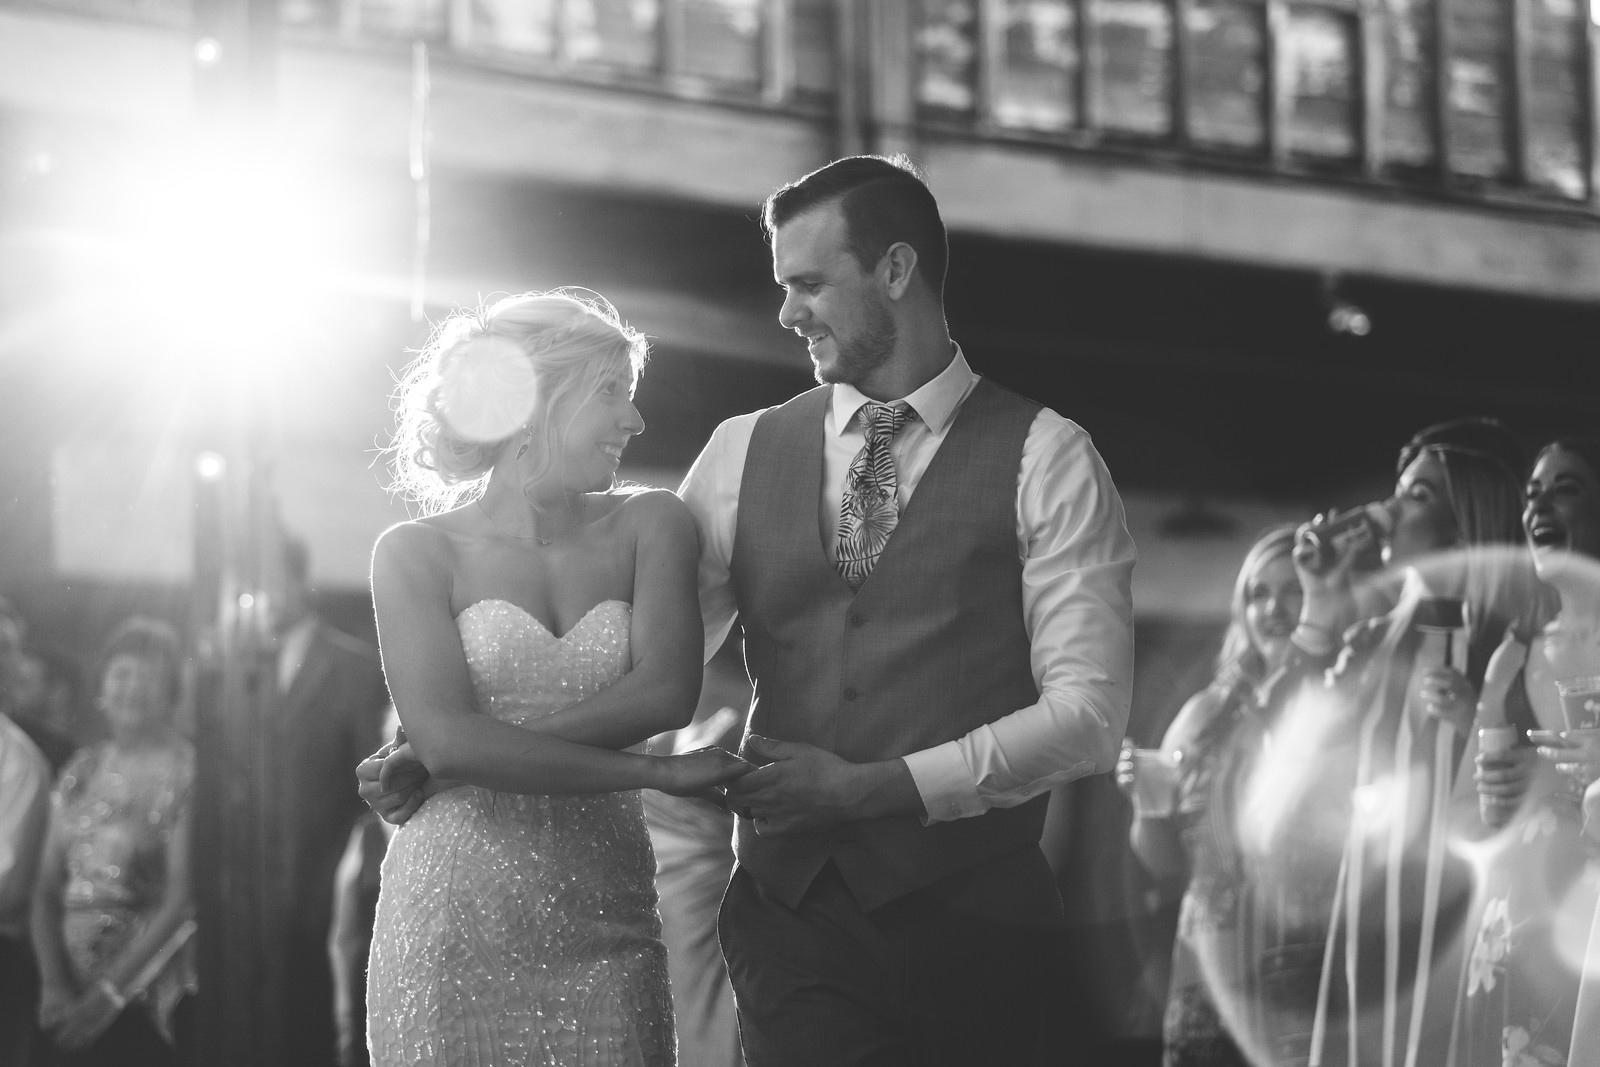 The-Glass-Factory-Wedding-Photographer-Adam-Szarmack-90.jpg